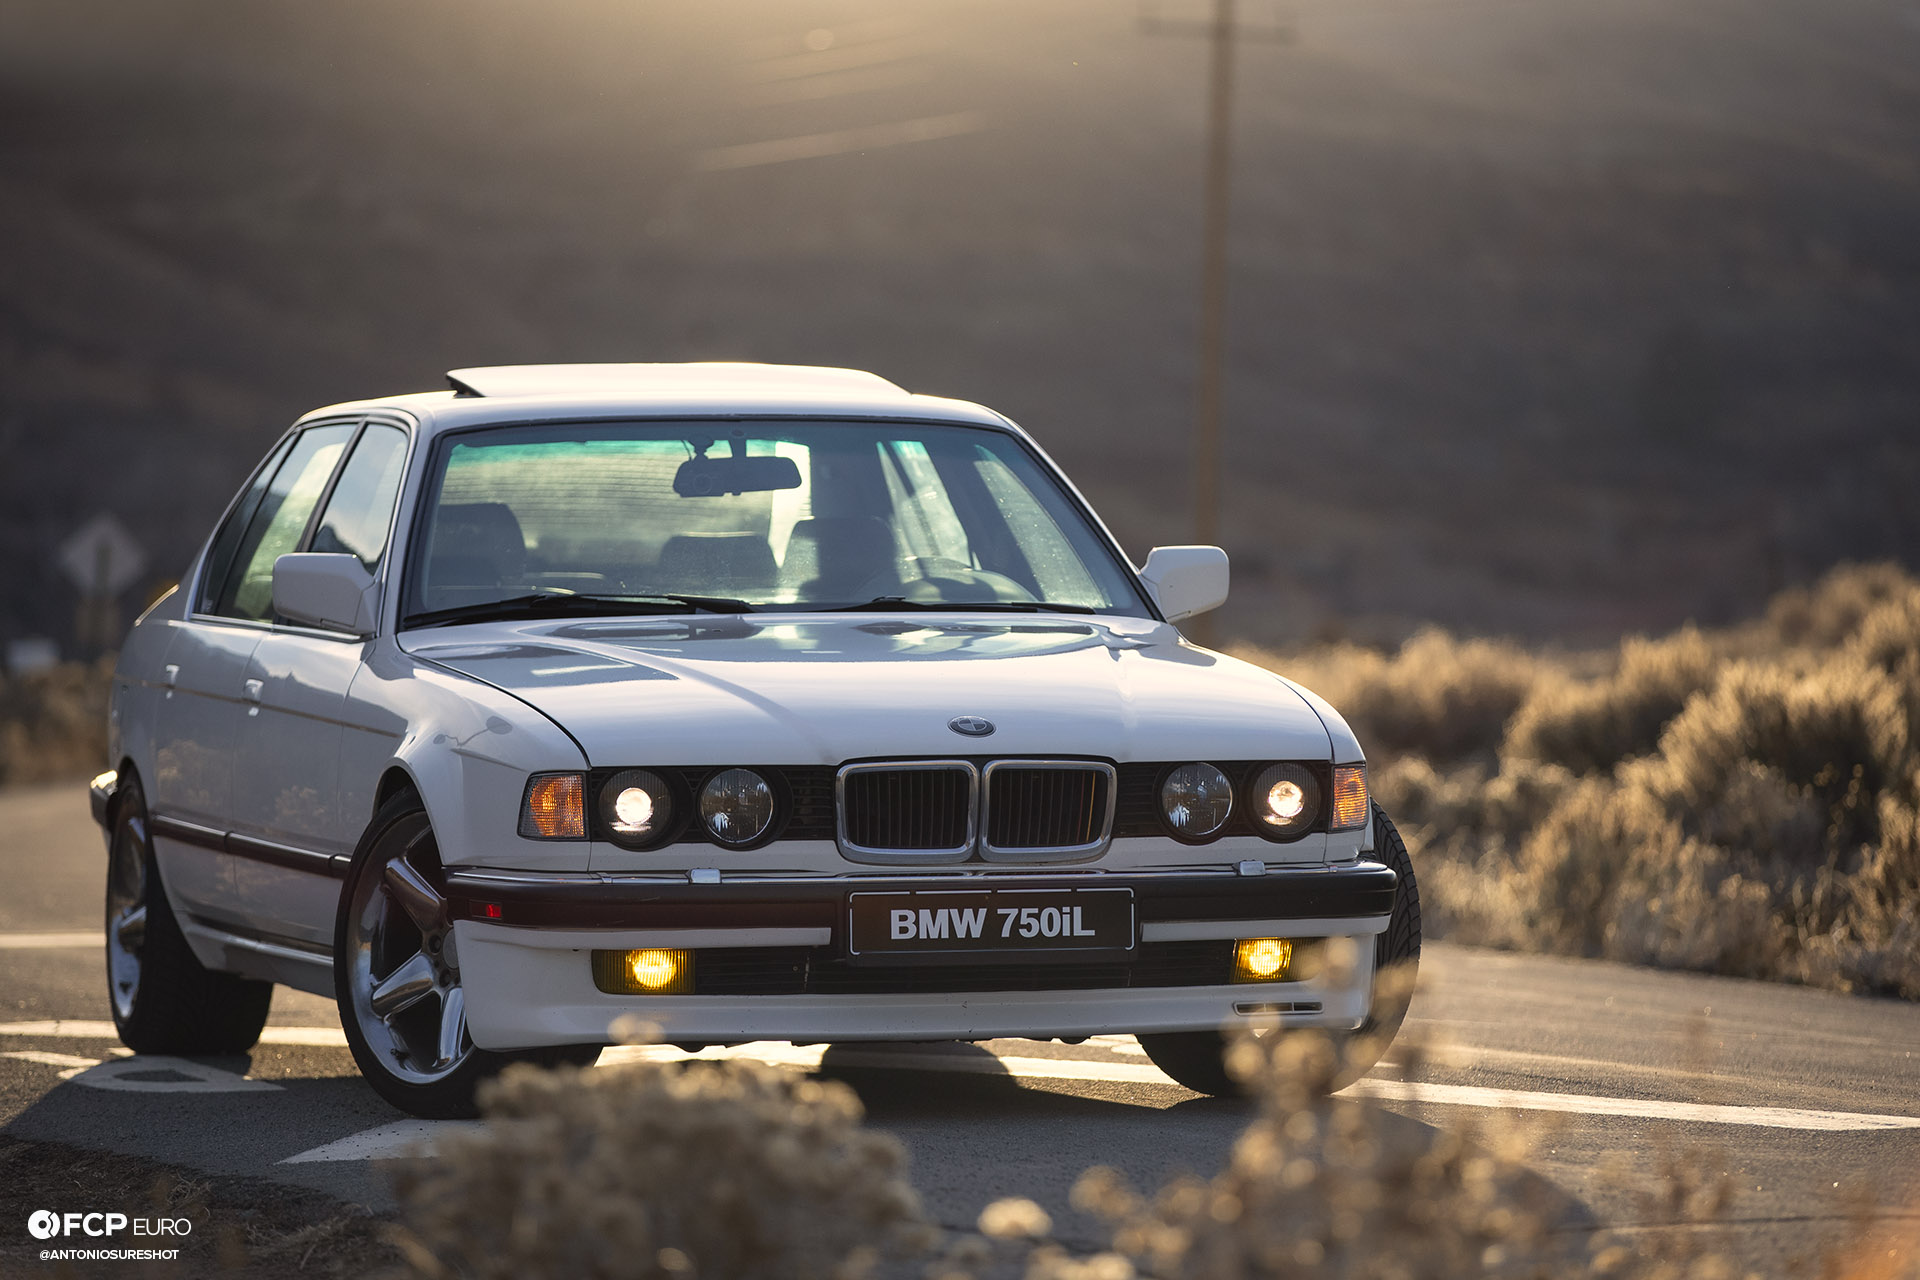 BMW E32 750iL 6 speed ANT23894